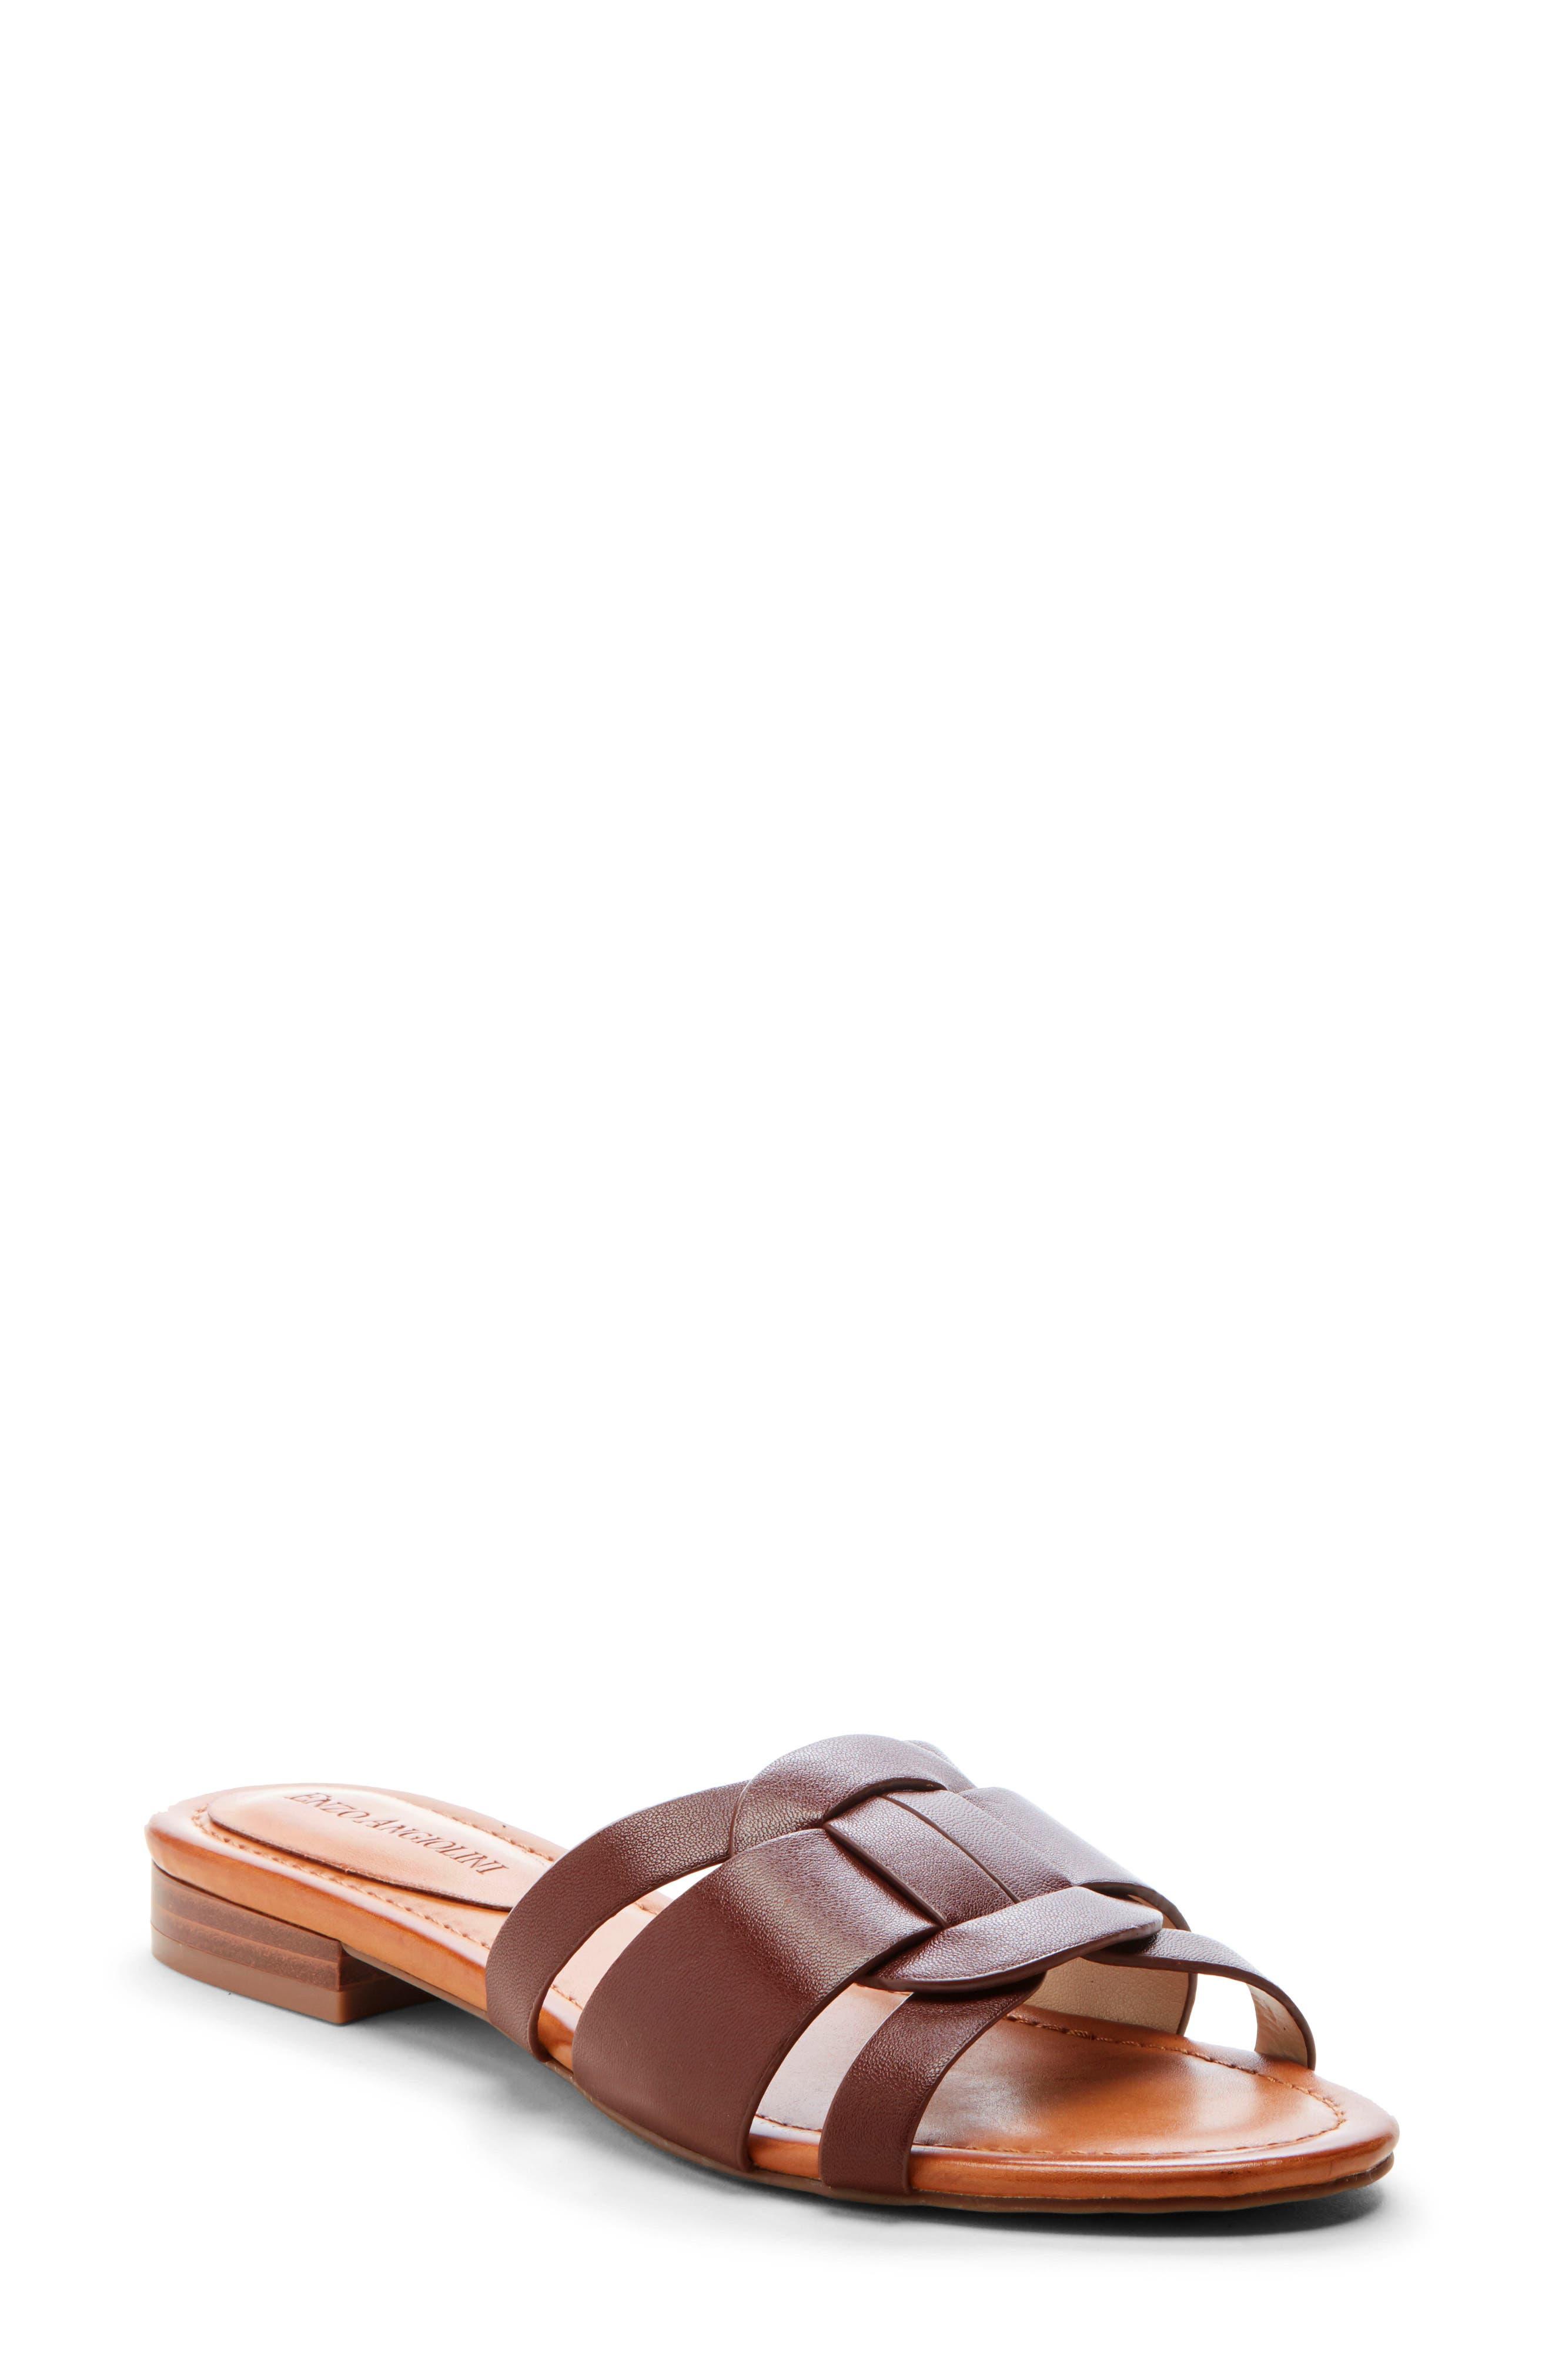 Enzo Angiolini Golda Slide Sandal, Brown